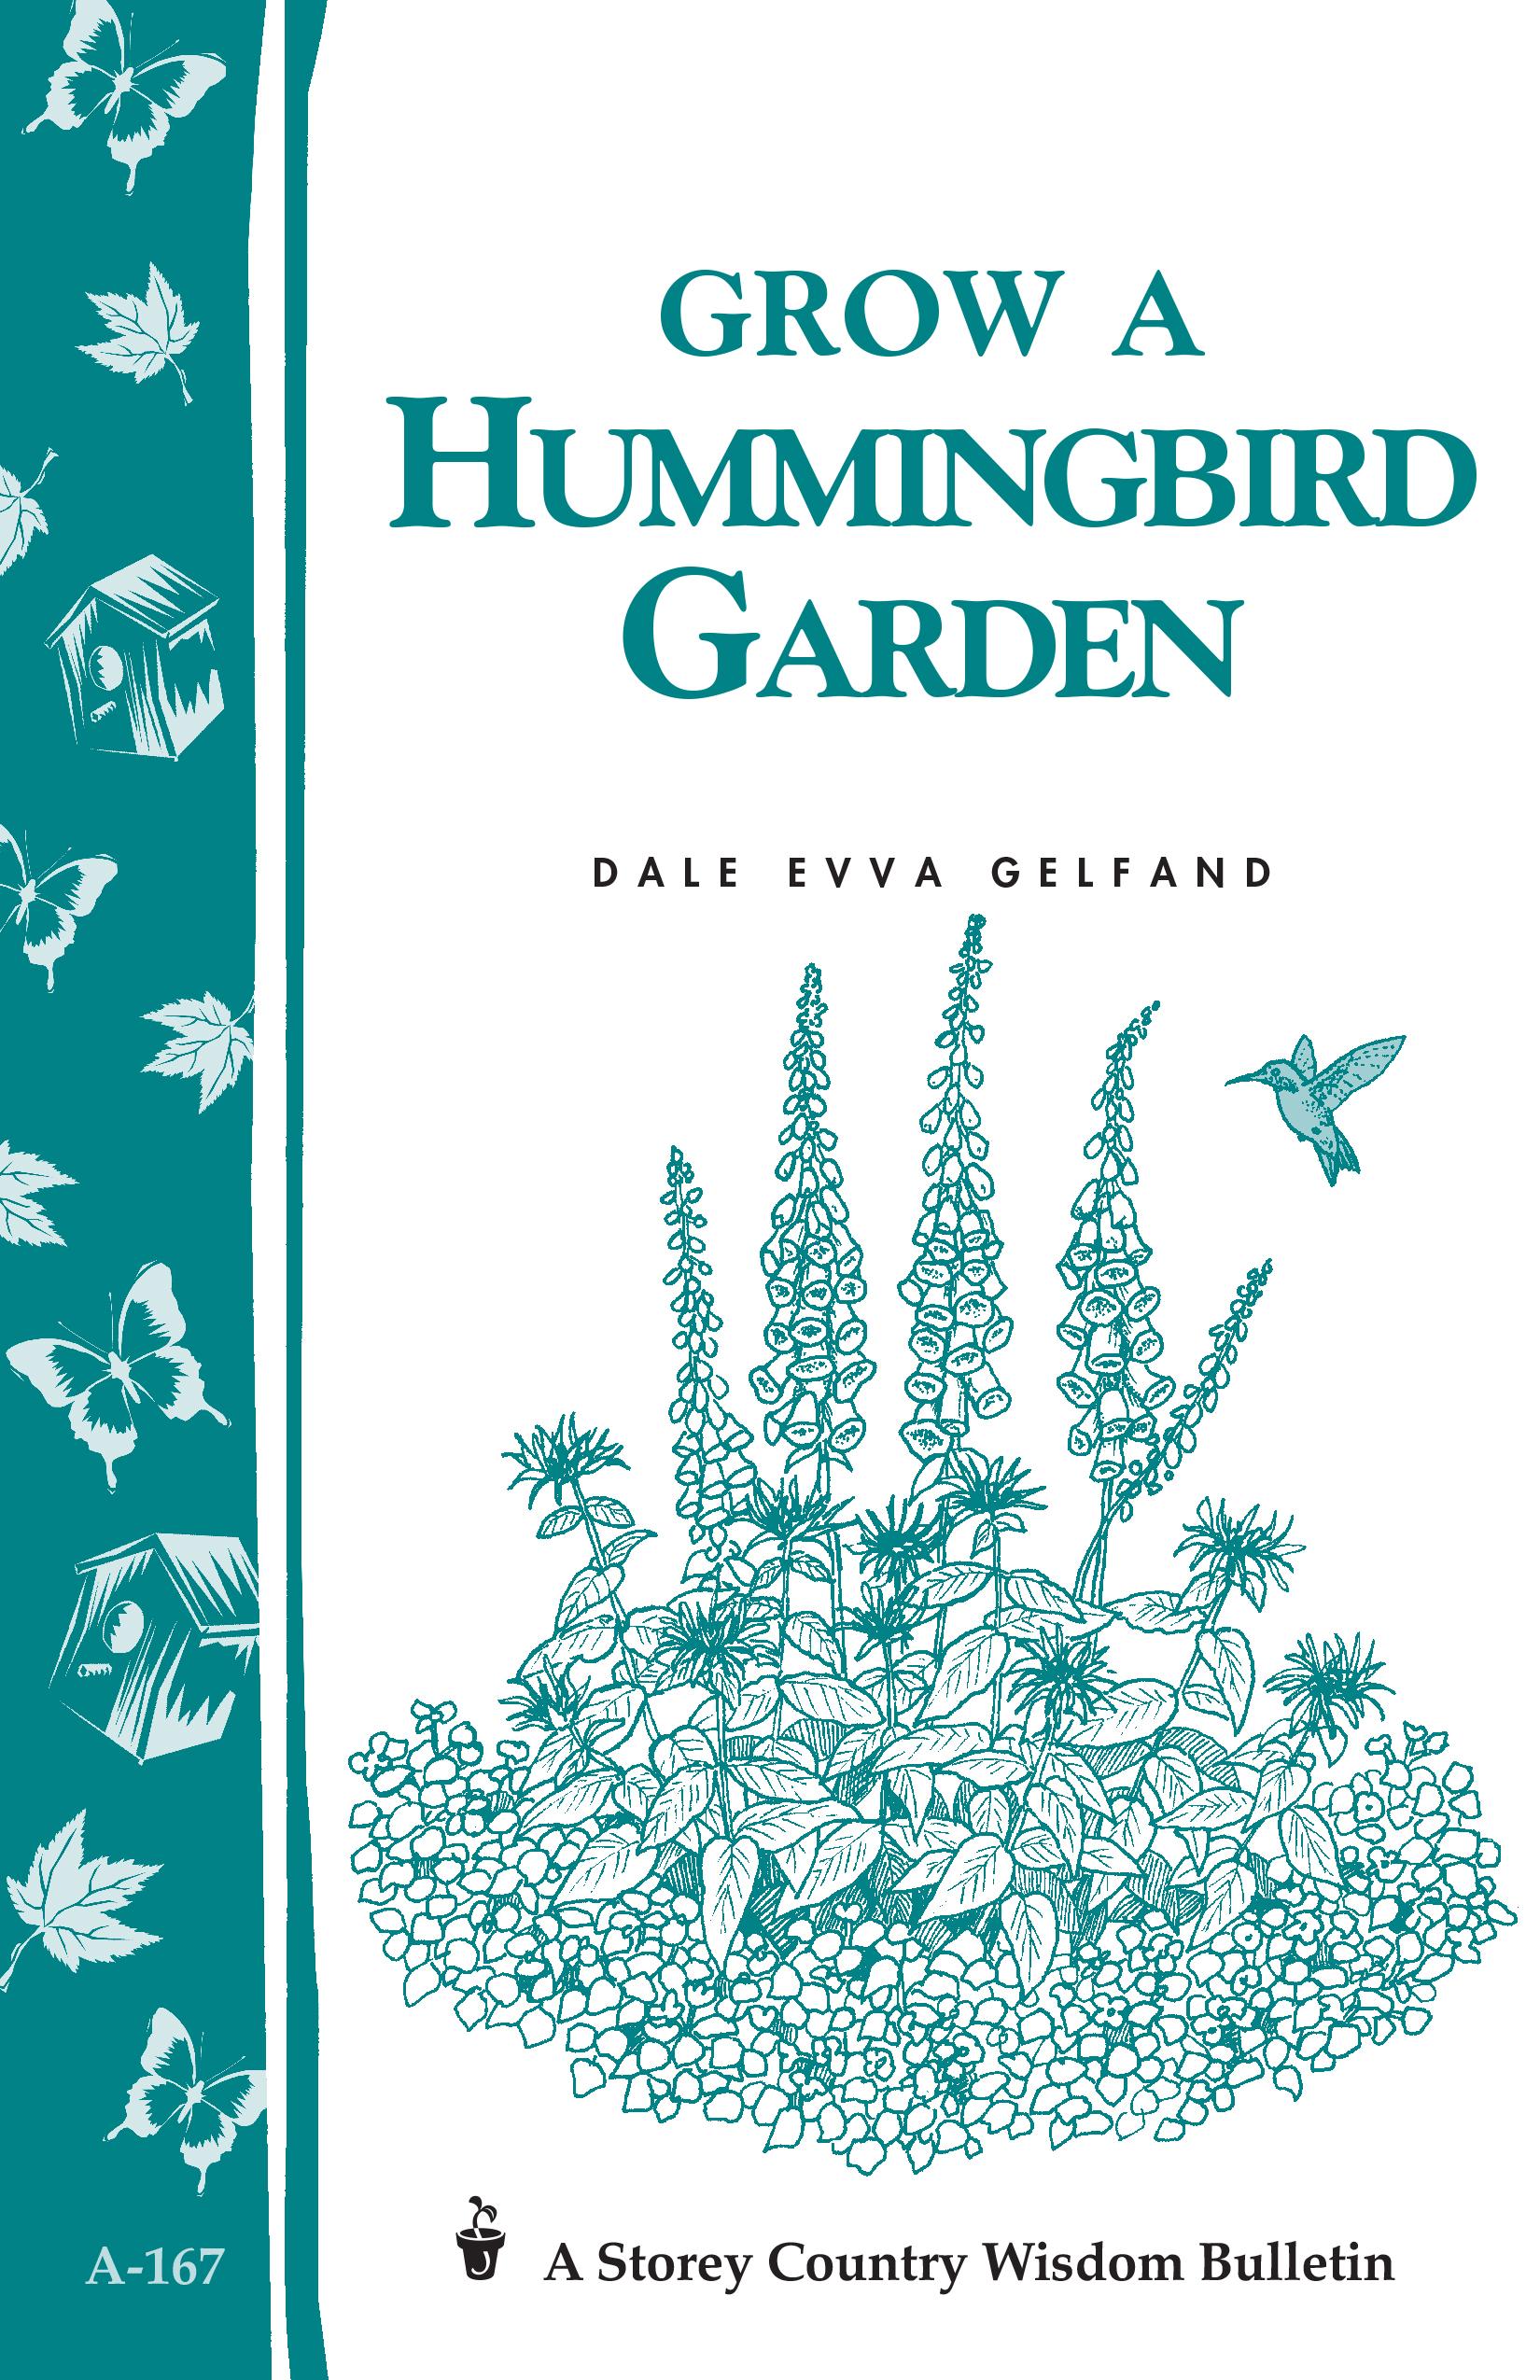 Grow a Hummingbird Garden Storey's Country Wisdom Bulletin A-167 - Dale Evva Gelfand